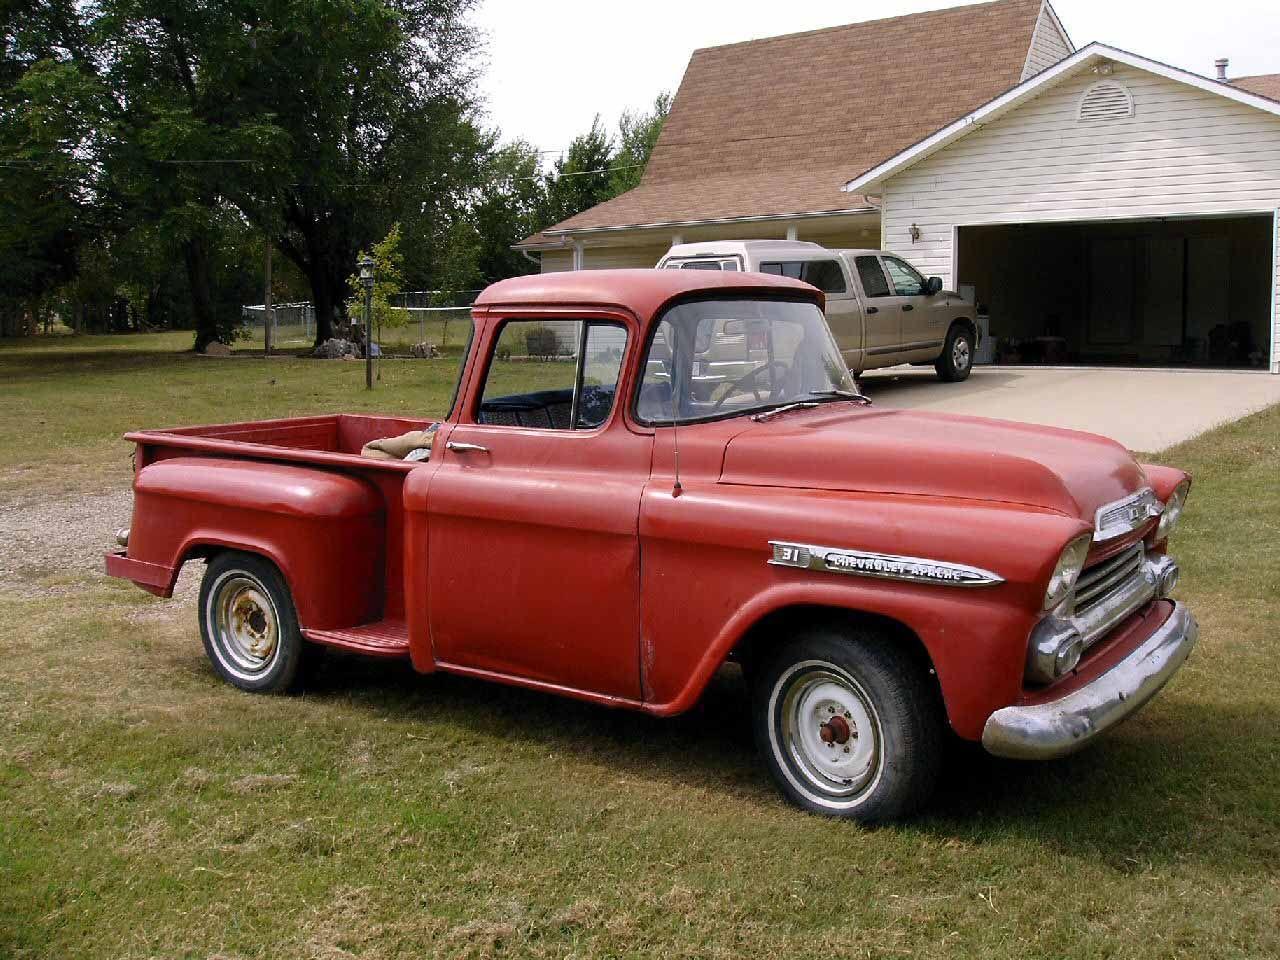 Grace\'s Dad\'s old truck Google Image Result for http://www.stovebolt ...